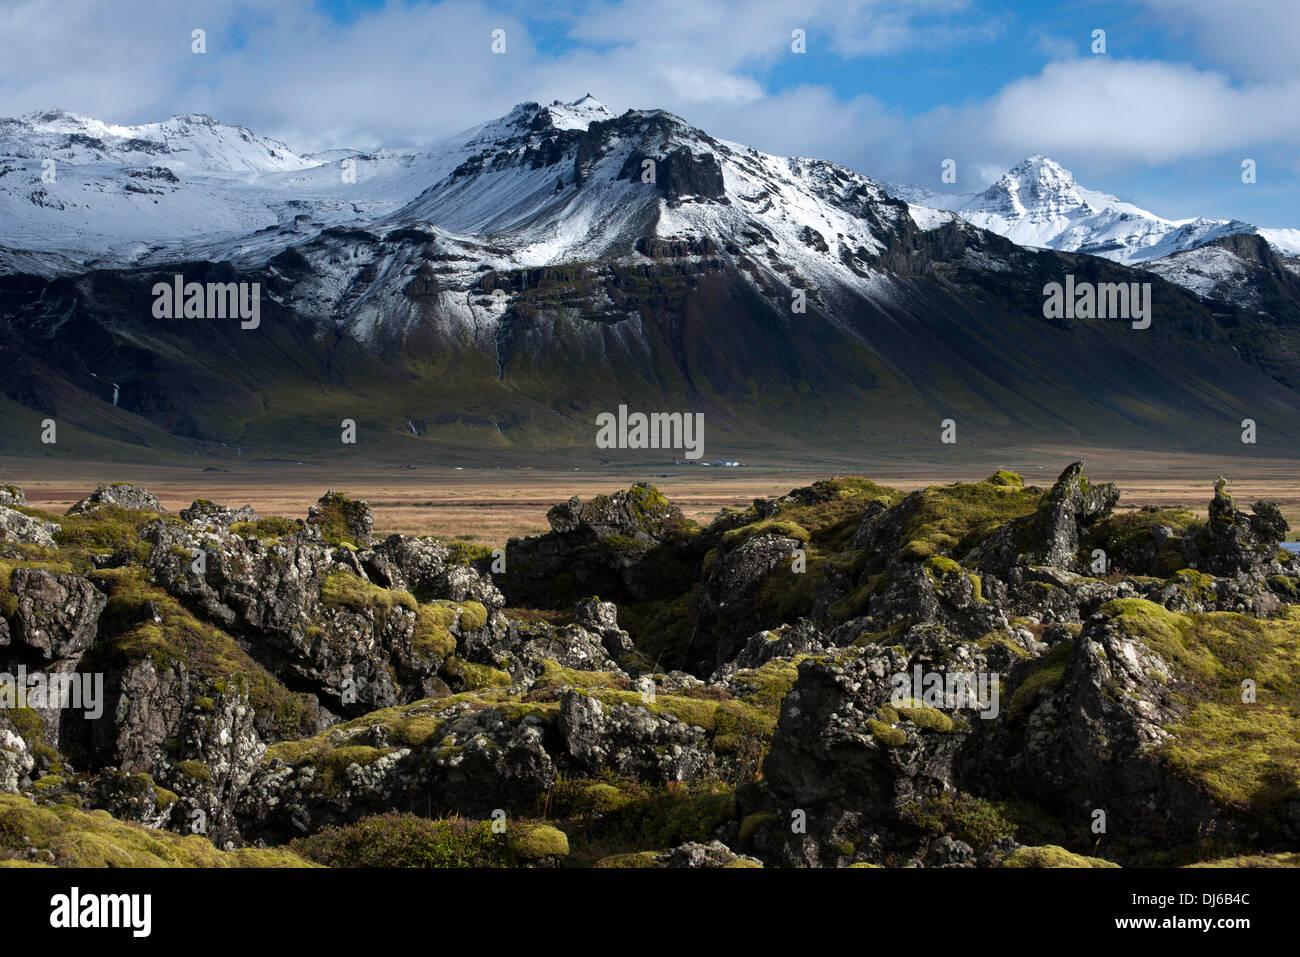 Alpine mountains, winter, east of Budir, Snaefellsnes Peninsula, Iceland, Europe - Stock Image